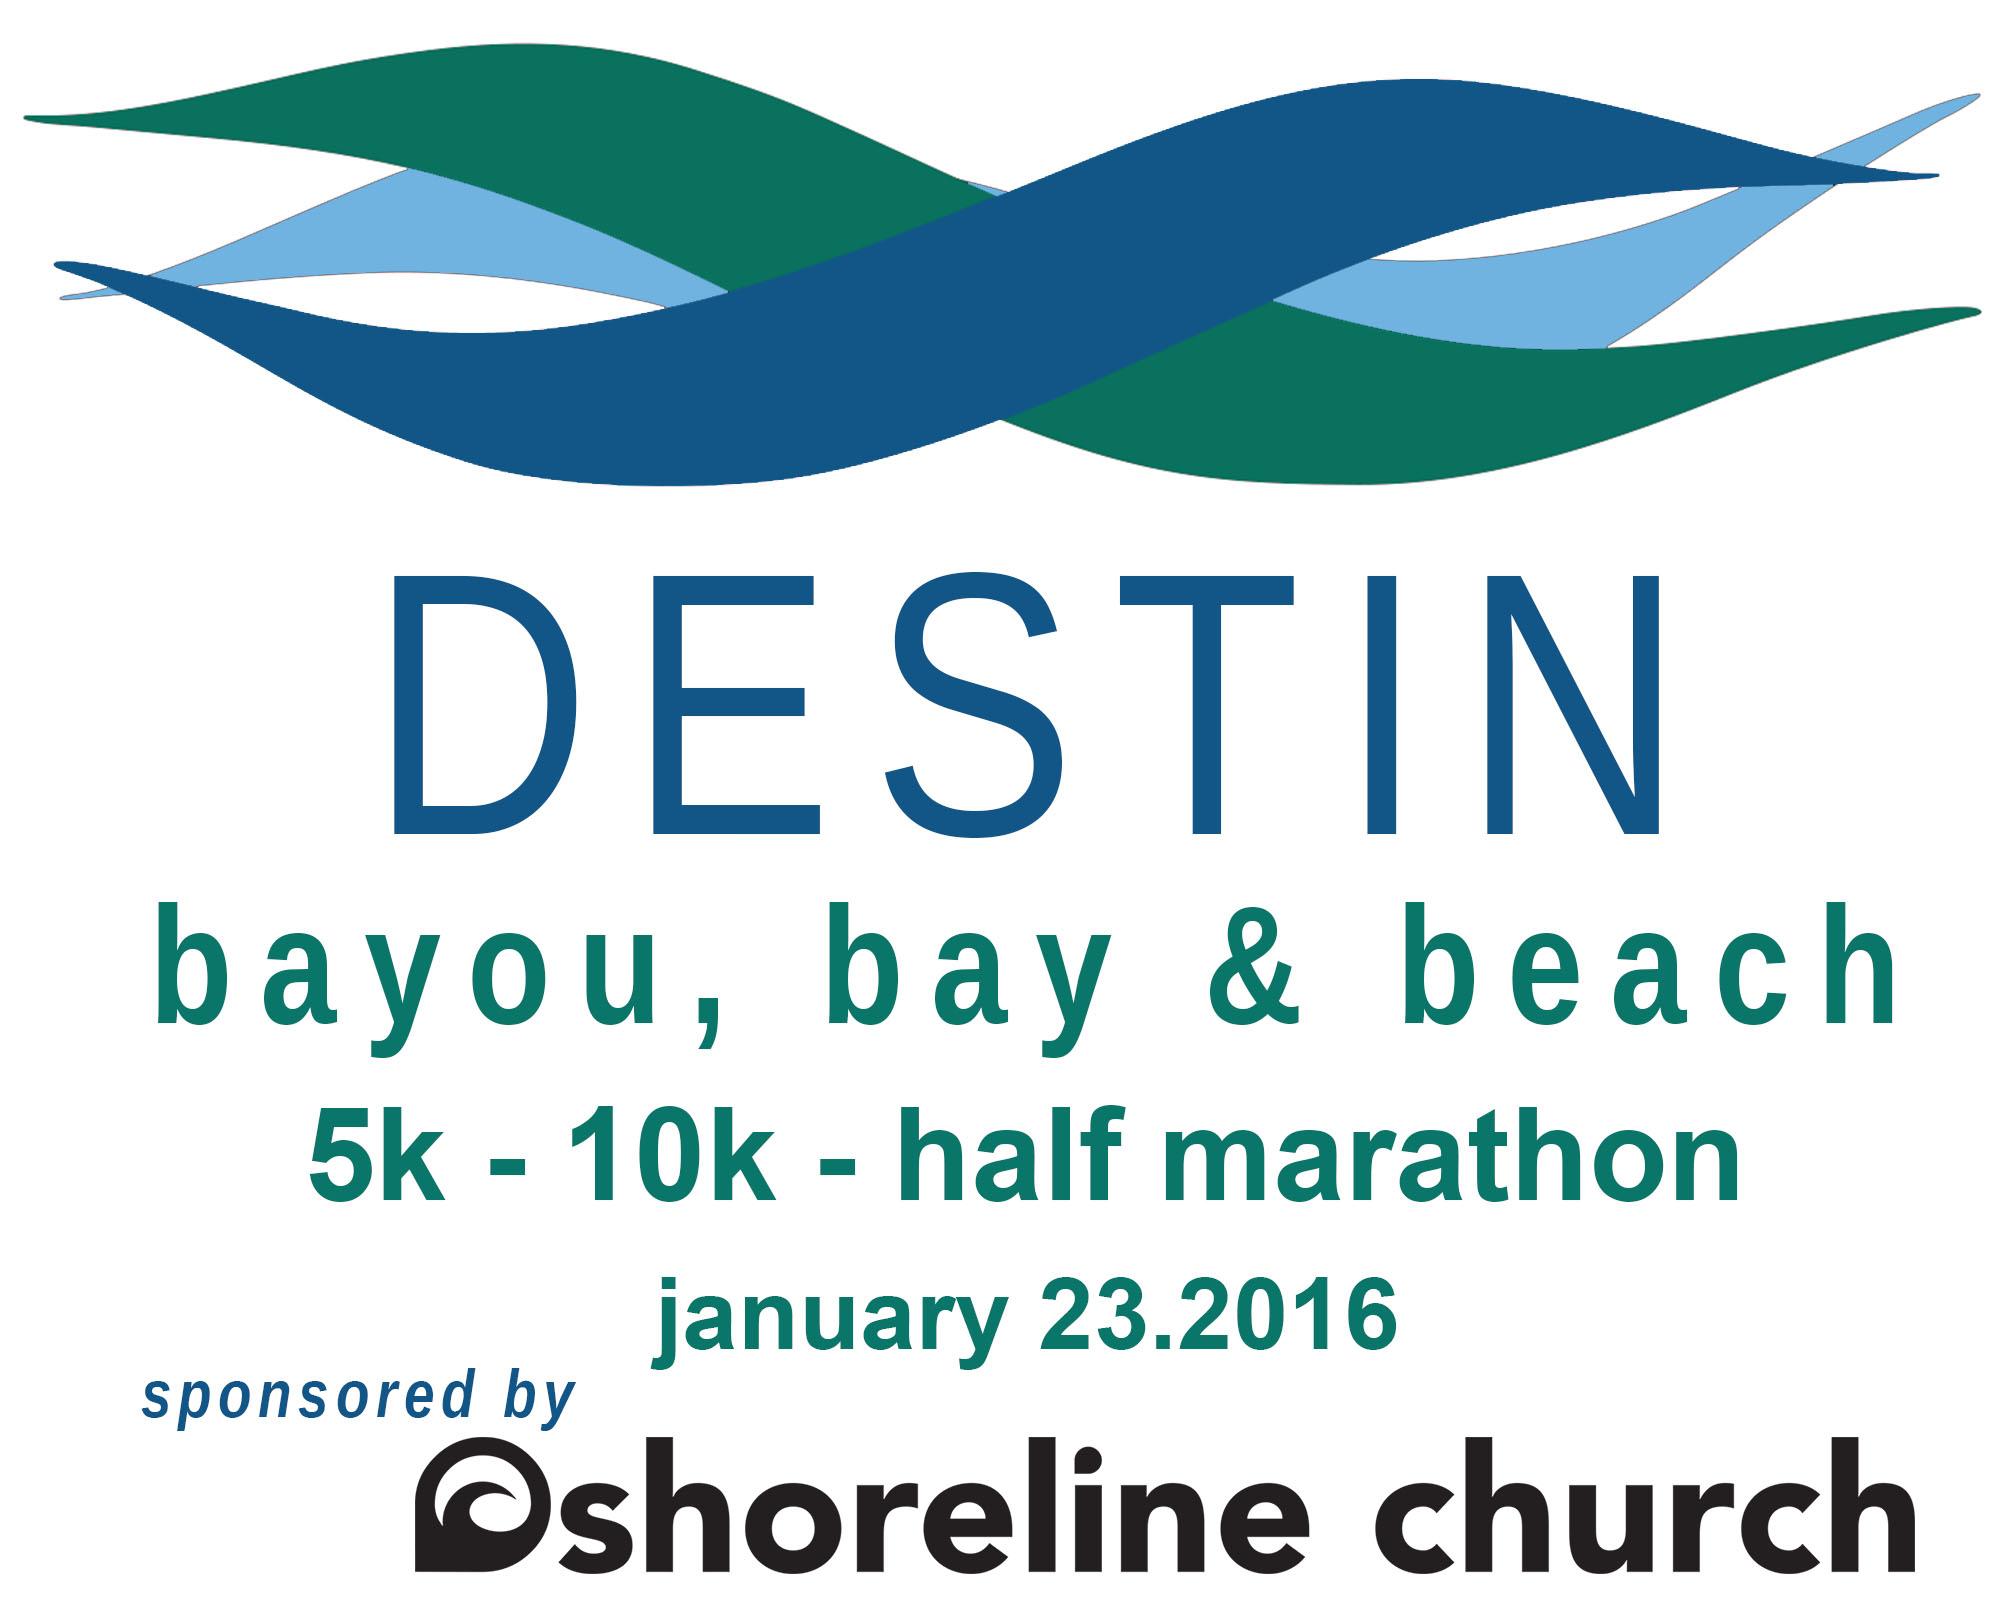 Destin's Bayou, Bay & Beach 5K, 10K & Half Marathon